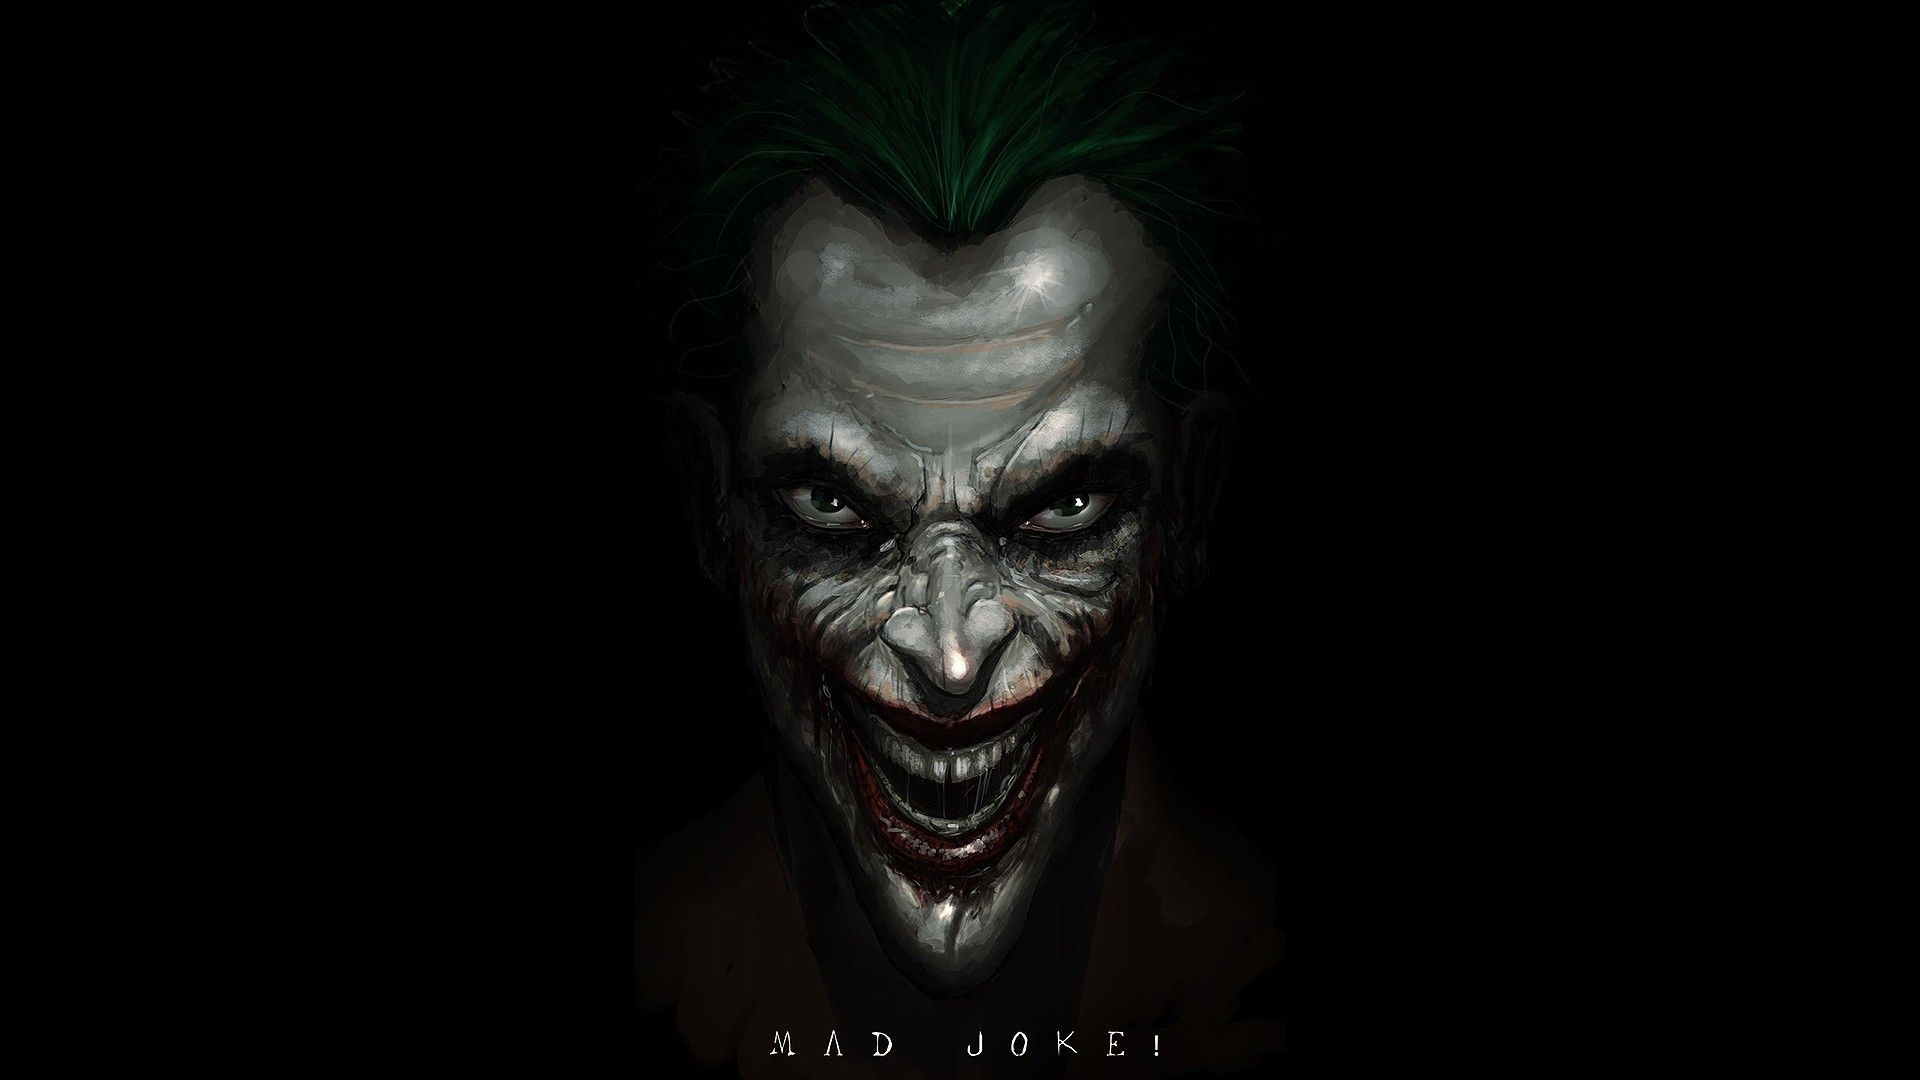 Joker Mobile Hd Wallpaper Wallpaper Download High Resolution 4k Wallpaper